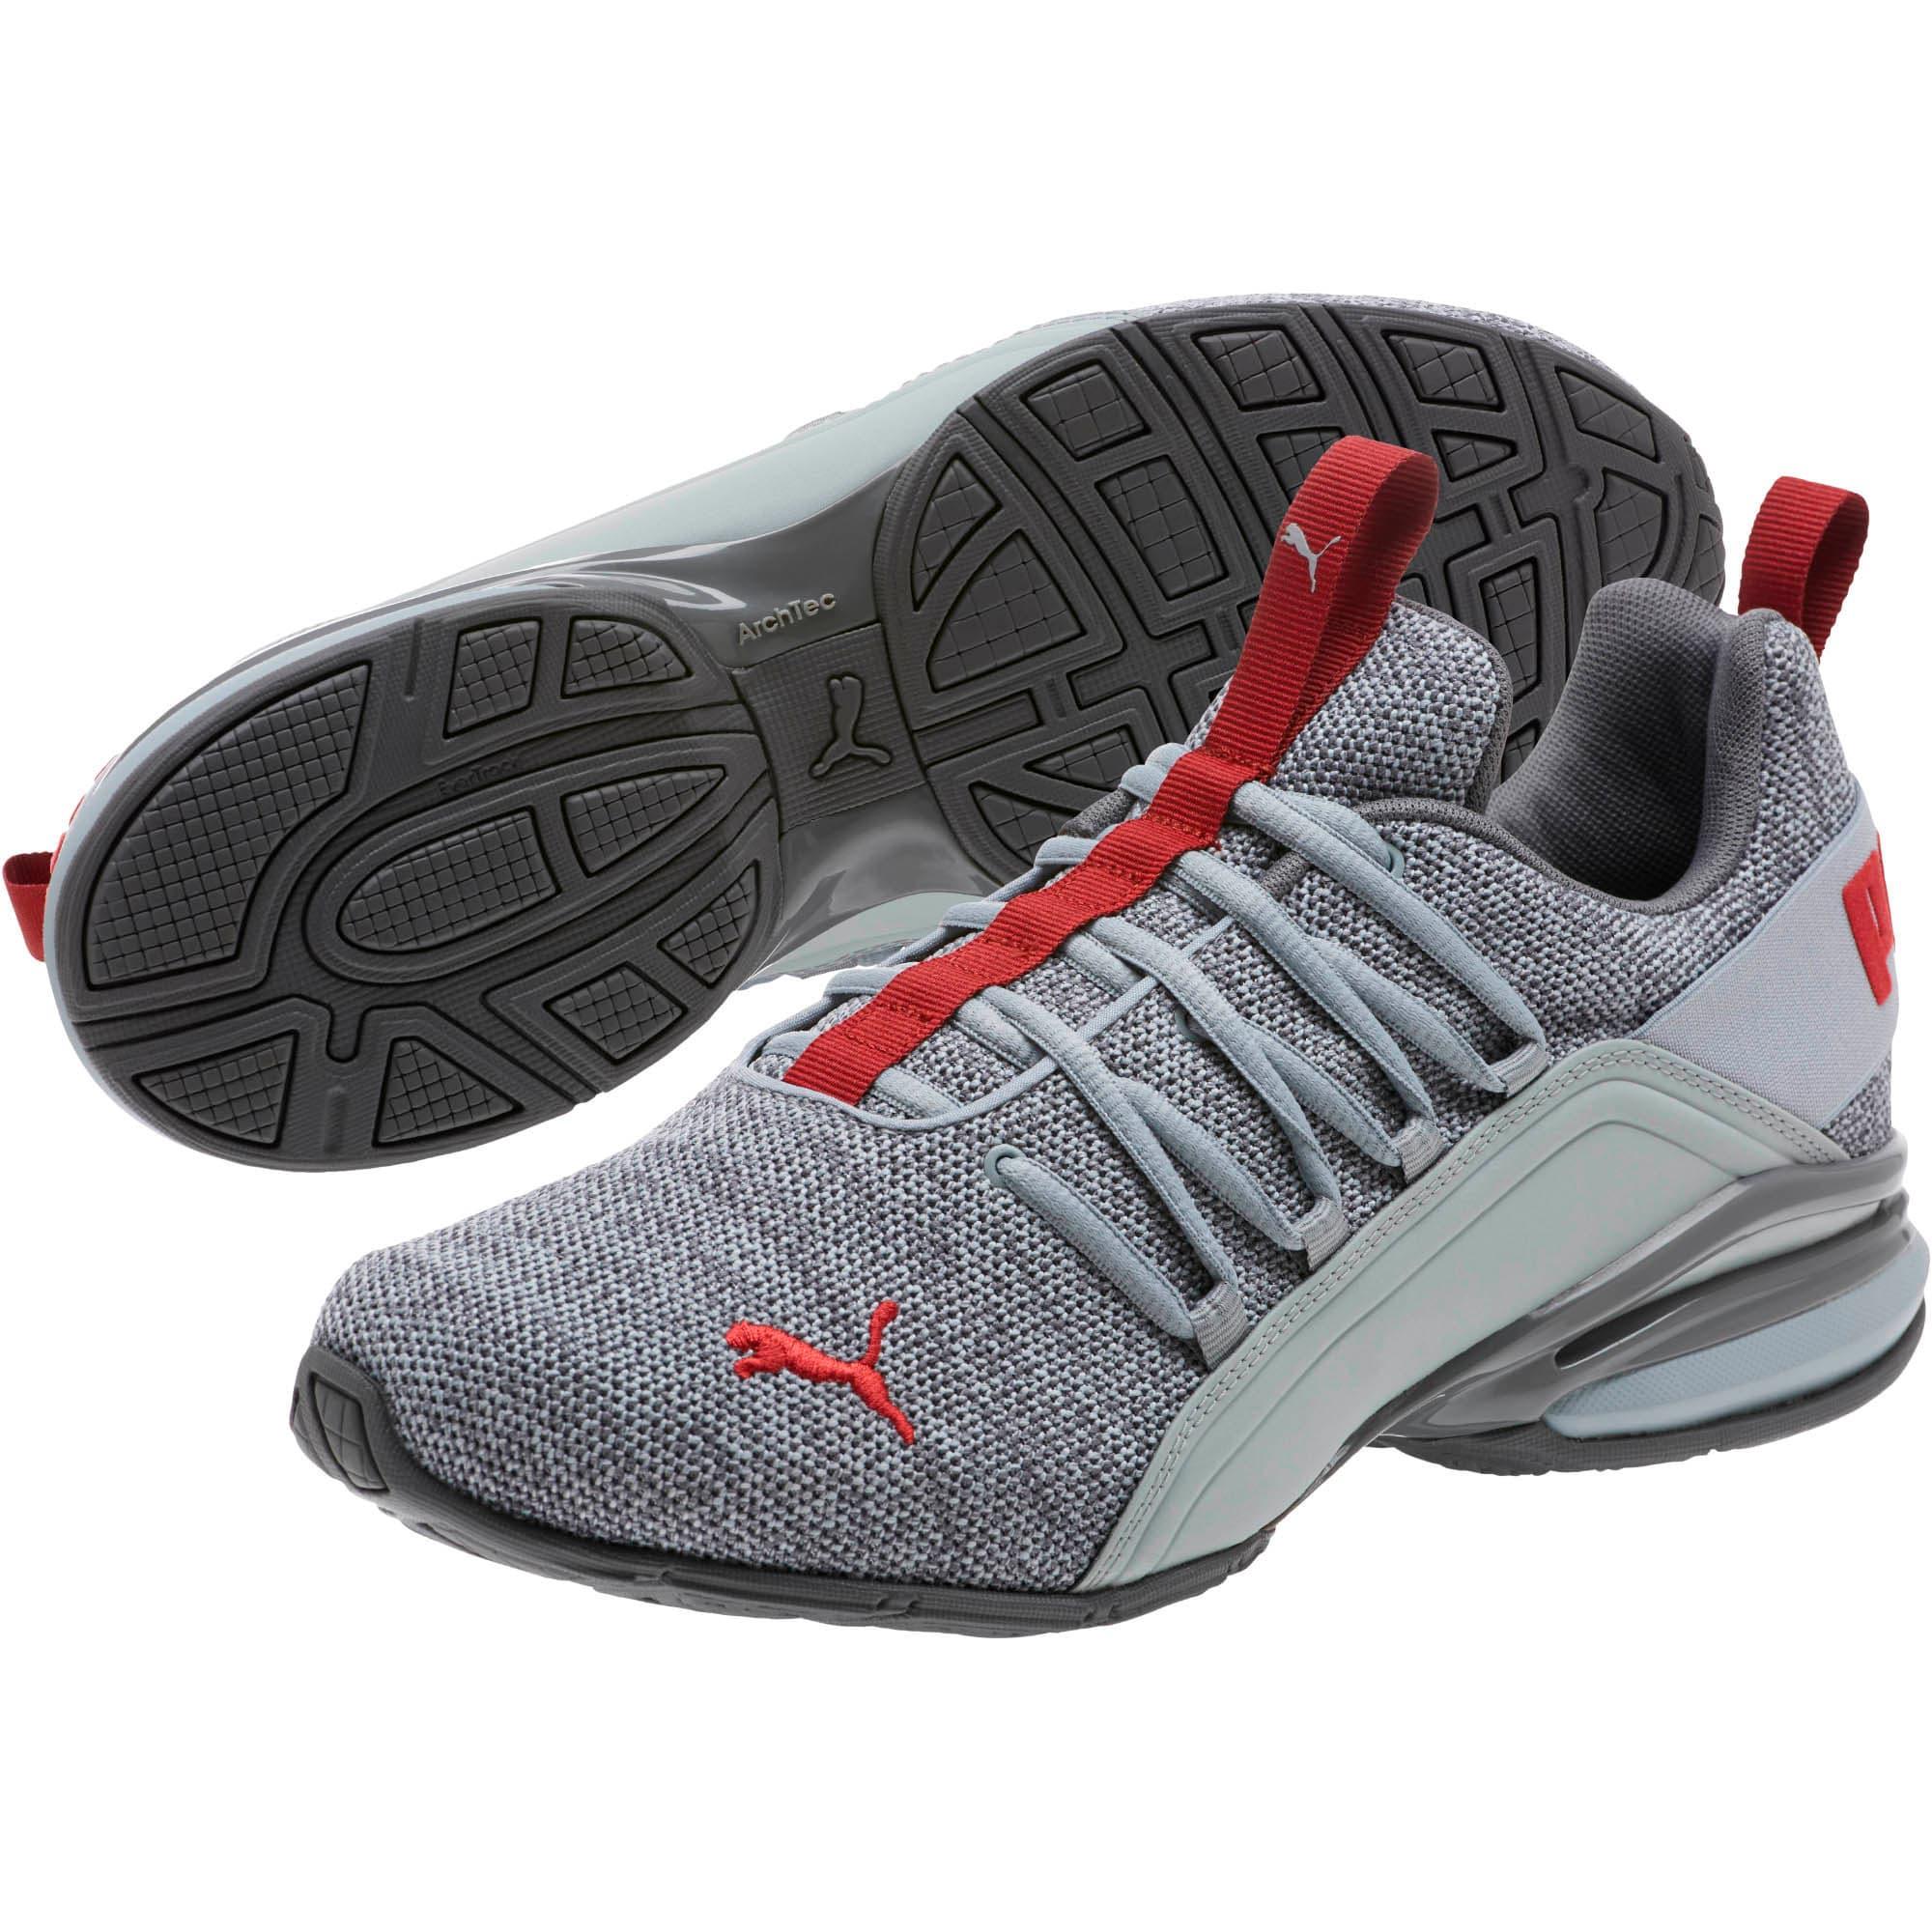 Thumbnail 2 of Axelion Men's Training Shoes, Quarry-QUIET SHADE-Red, medium